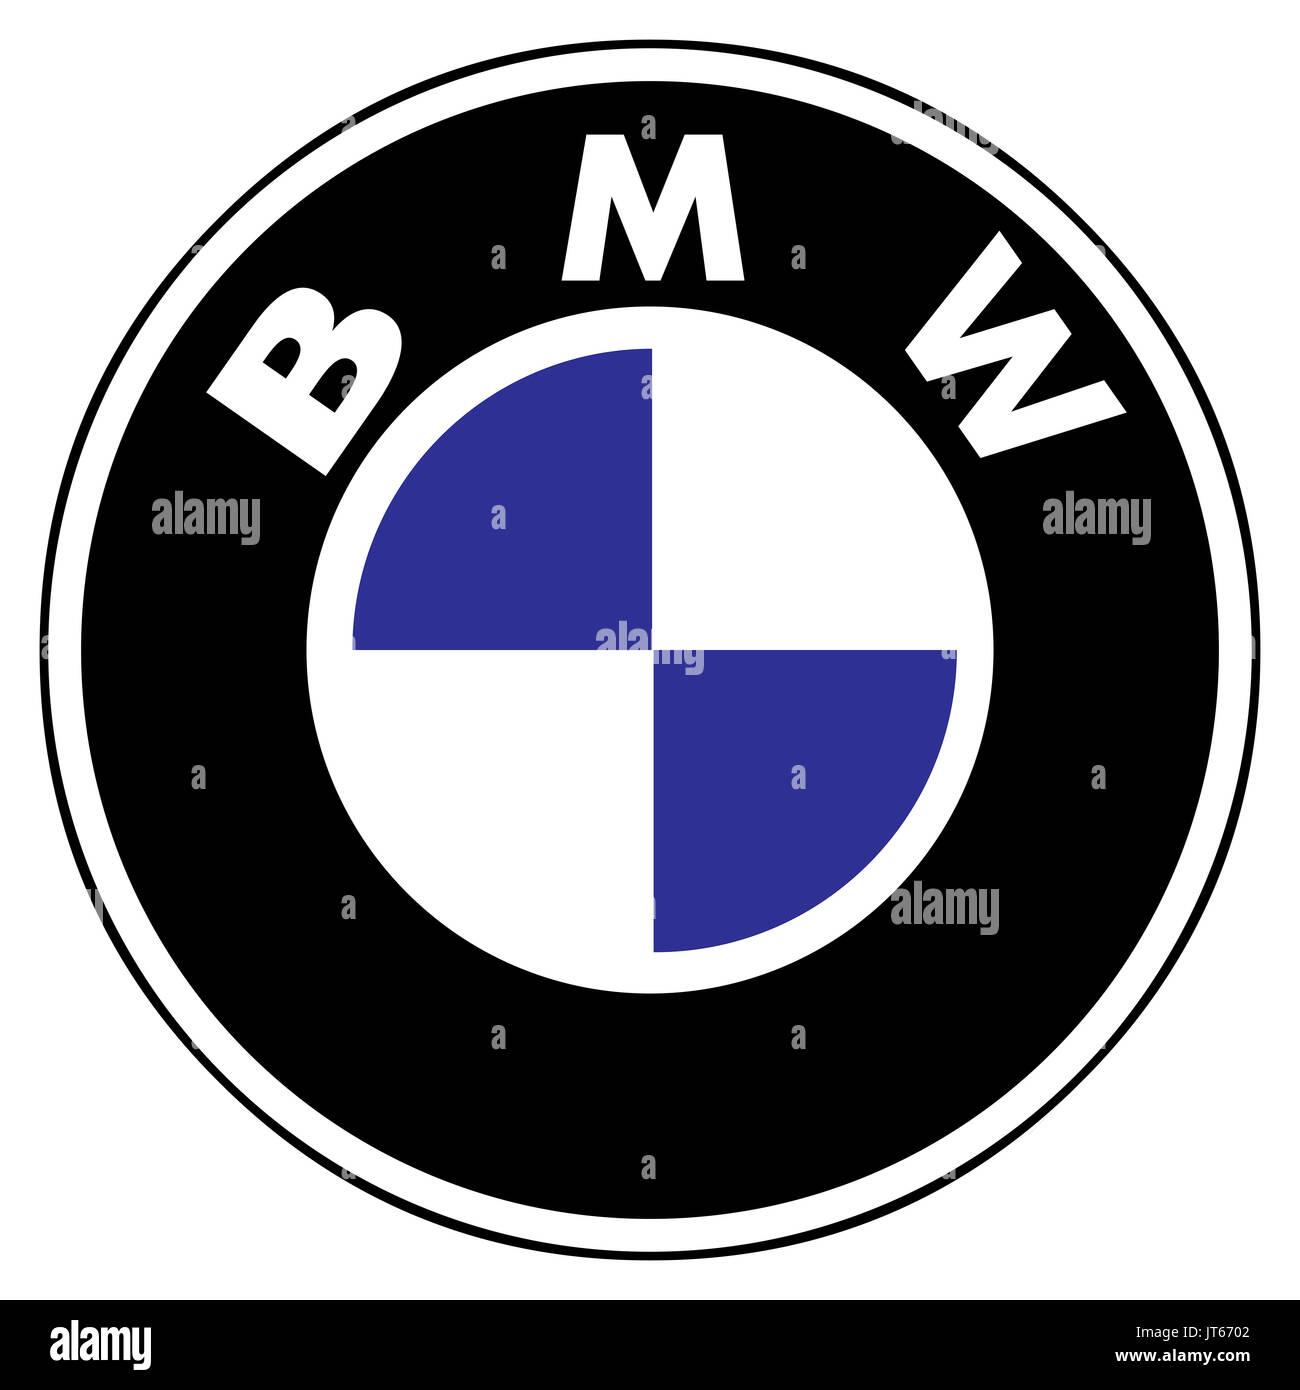 Bmw German Car Company Company Logo Dax 30 Companies Stock Photo